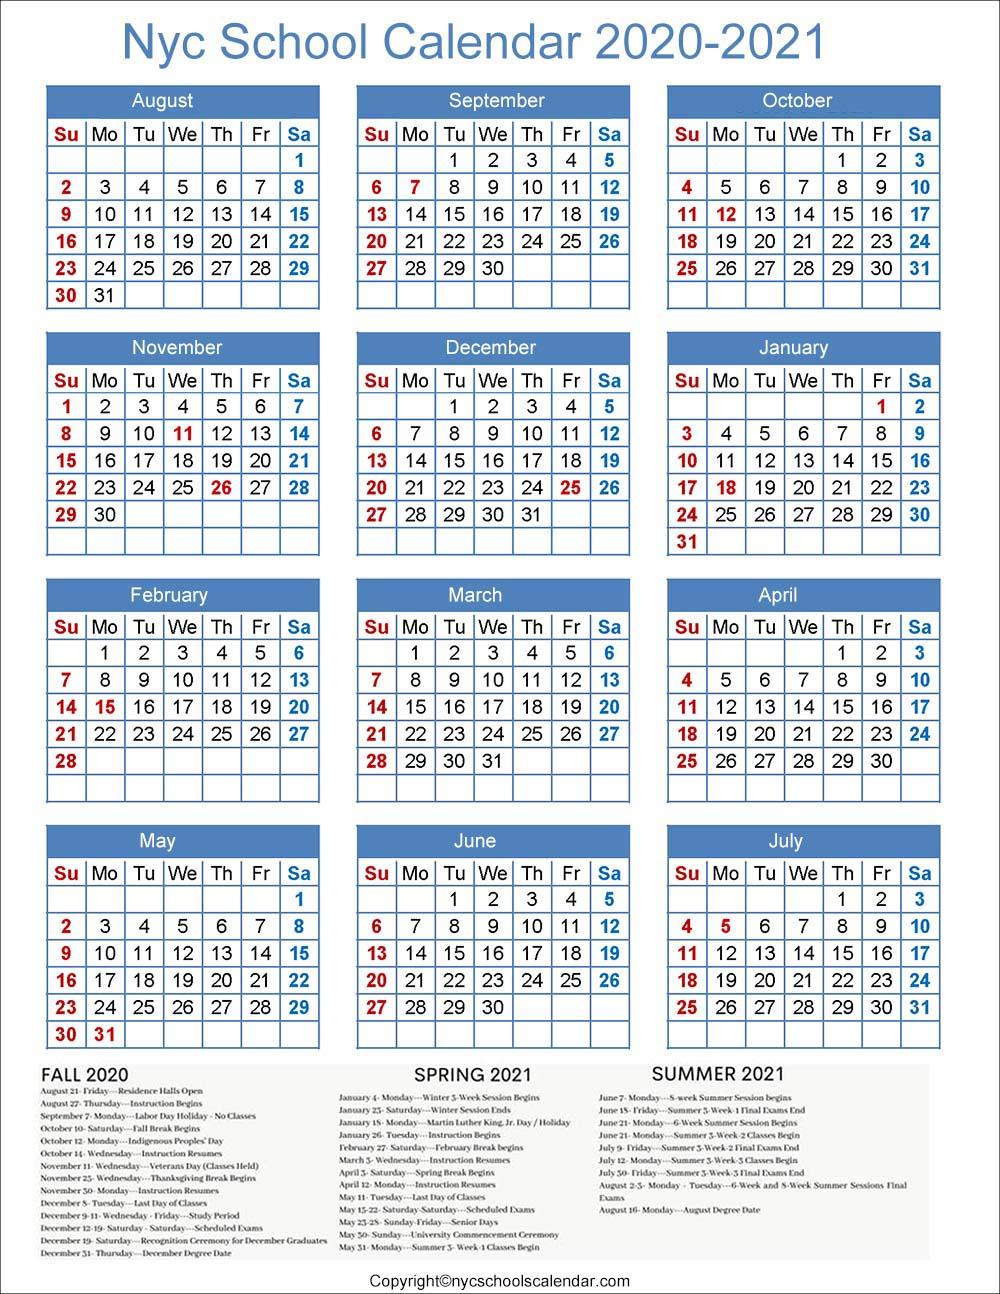 NYC DOE Calendar 2020